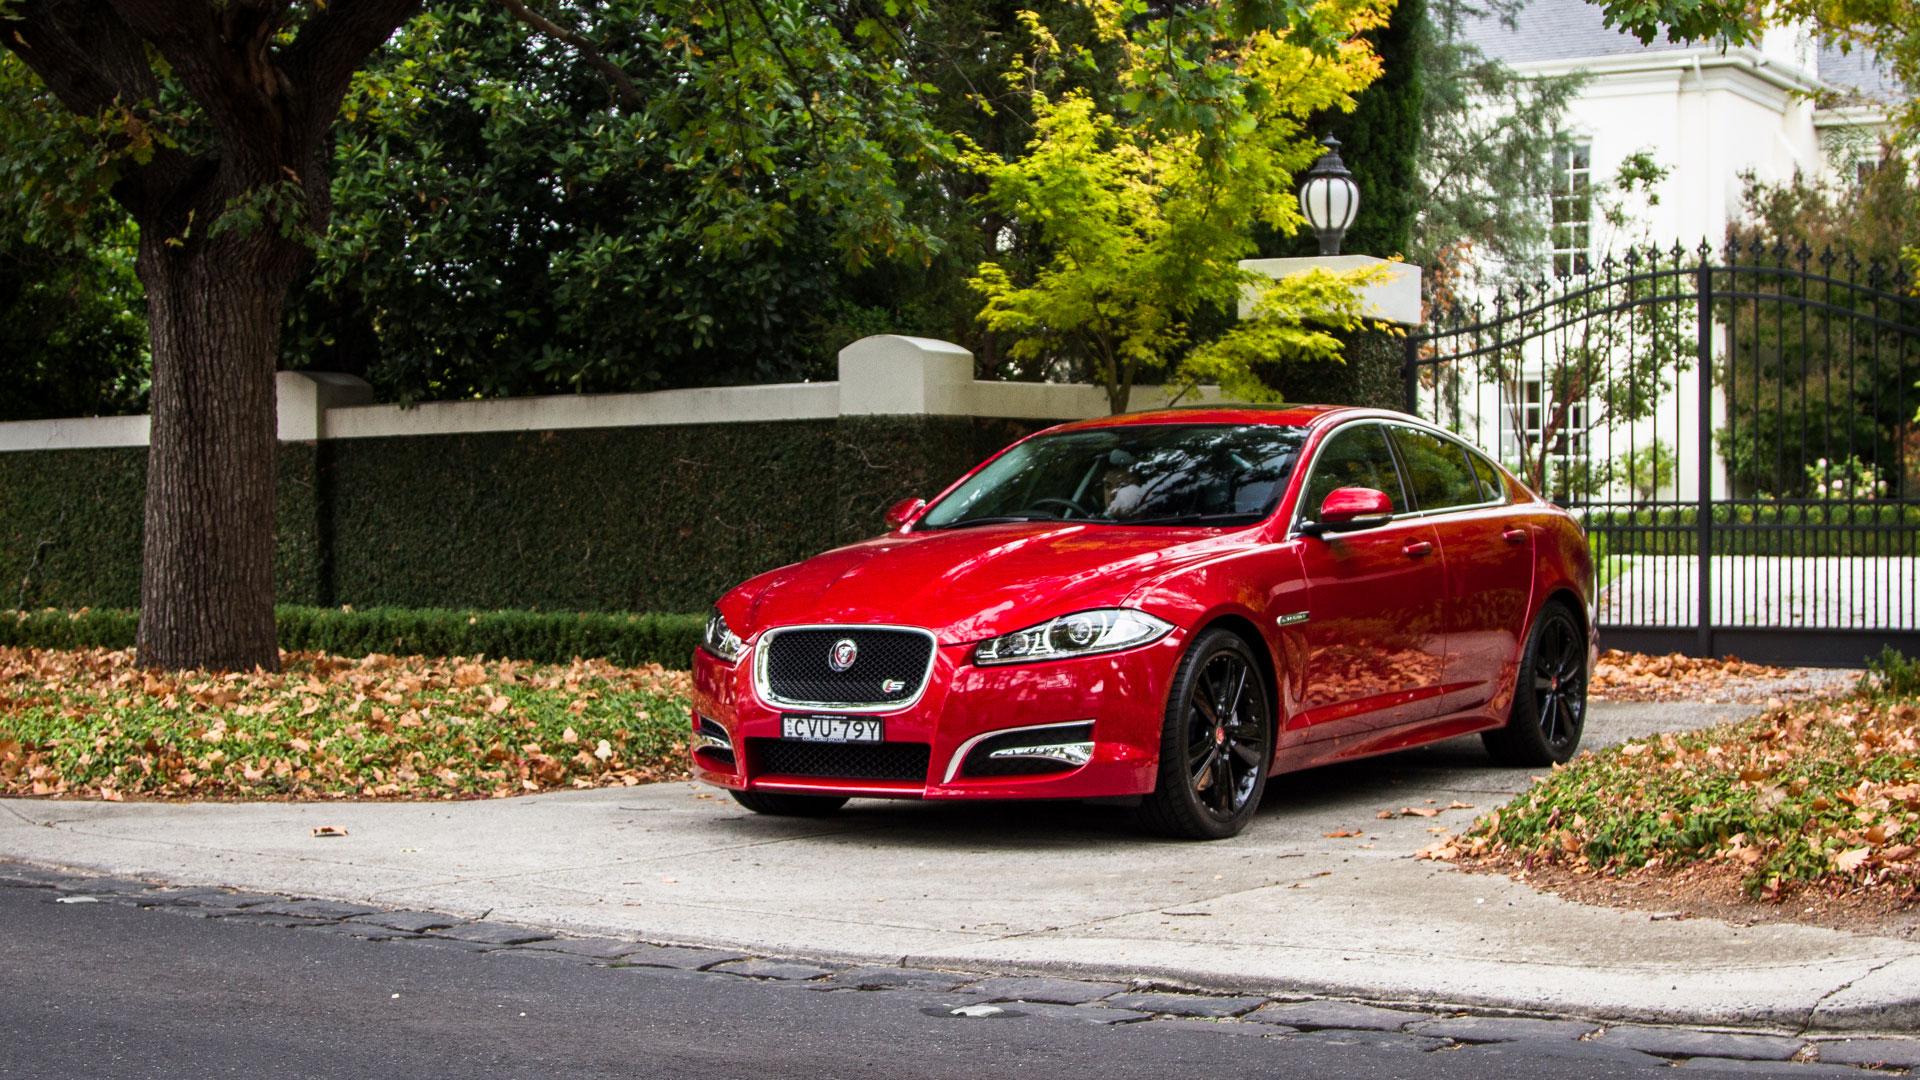 2015 Jaguar XF-S V6 diesel - run out review